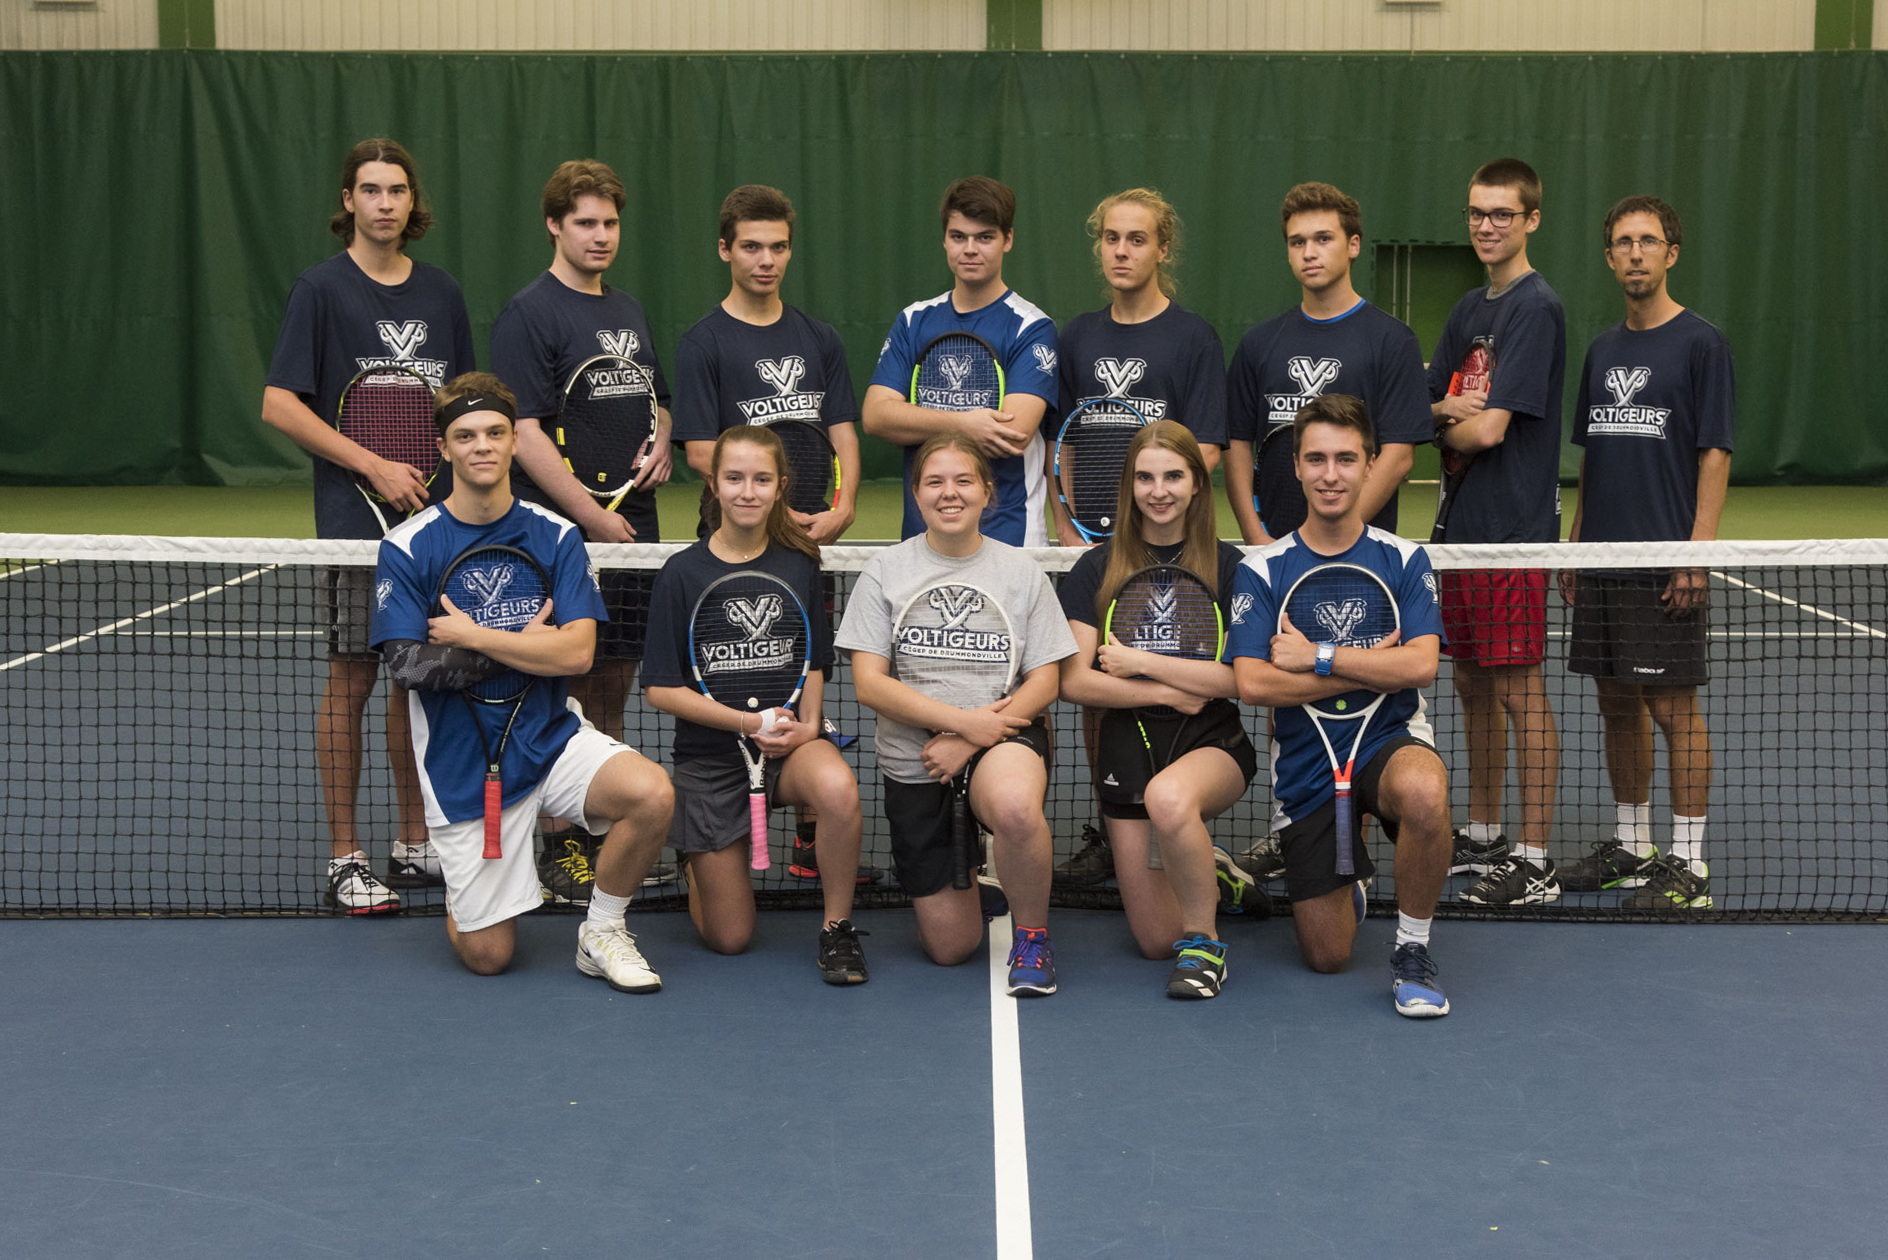 Tennis - Photo équipe